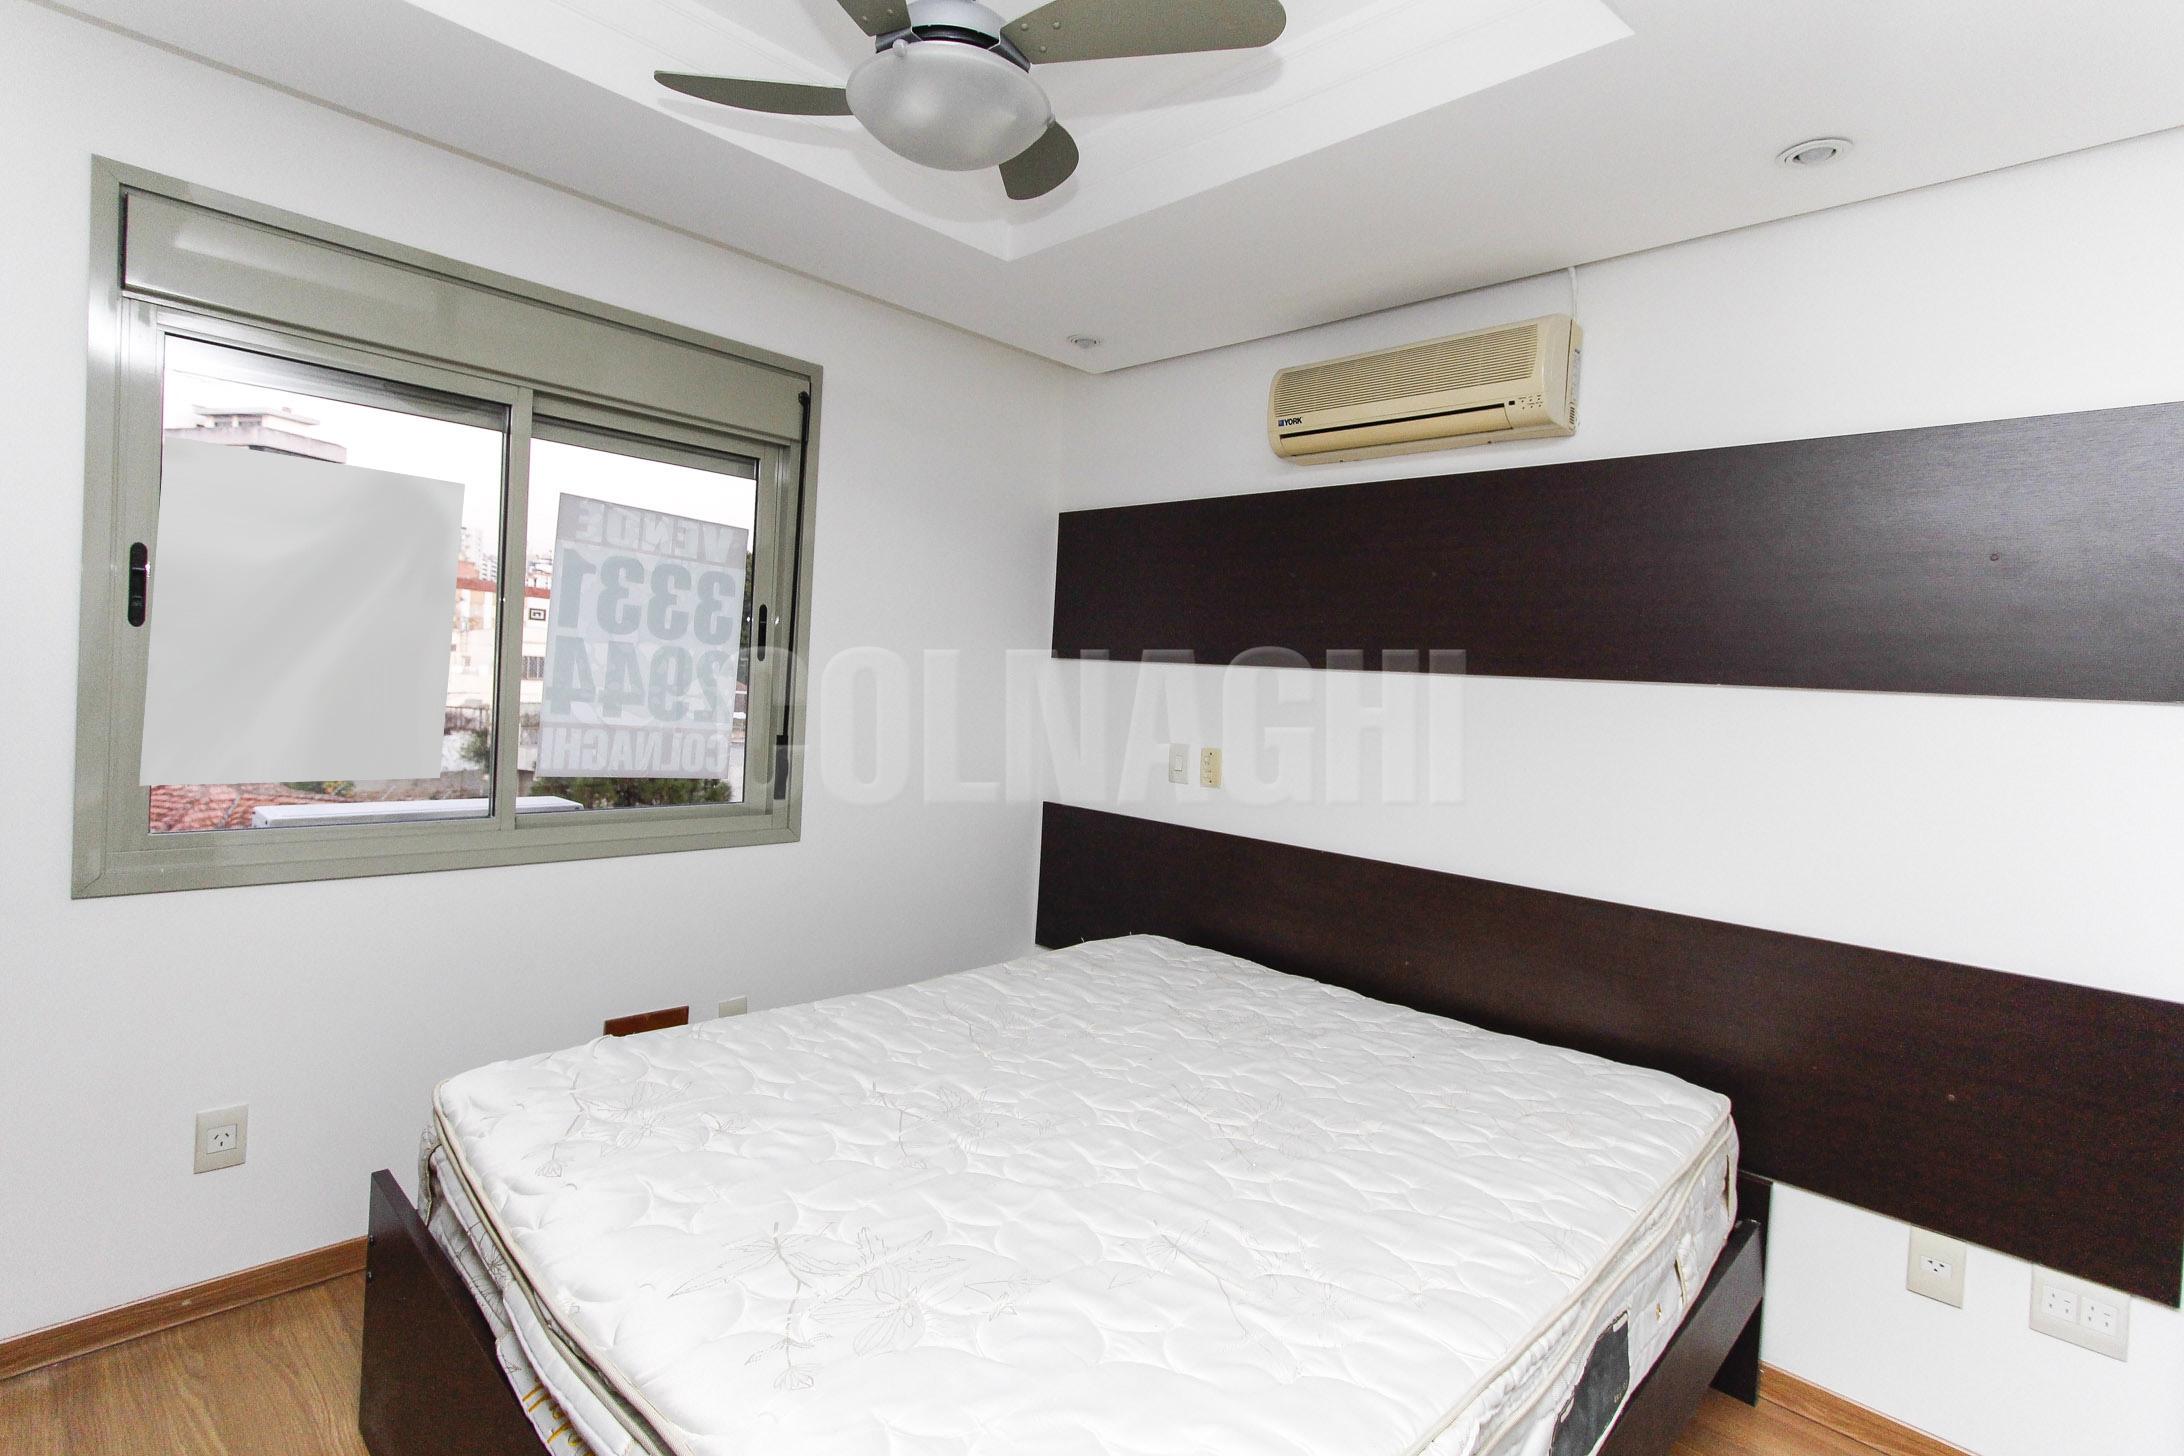 Dom Germano - Apto 3 Dorm, Auxiliadora, Porto Alegre (CL10693) - Foto 10